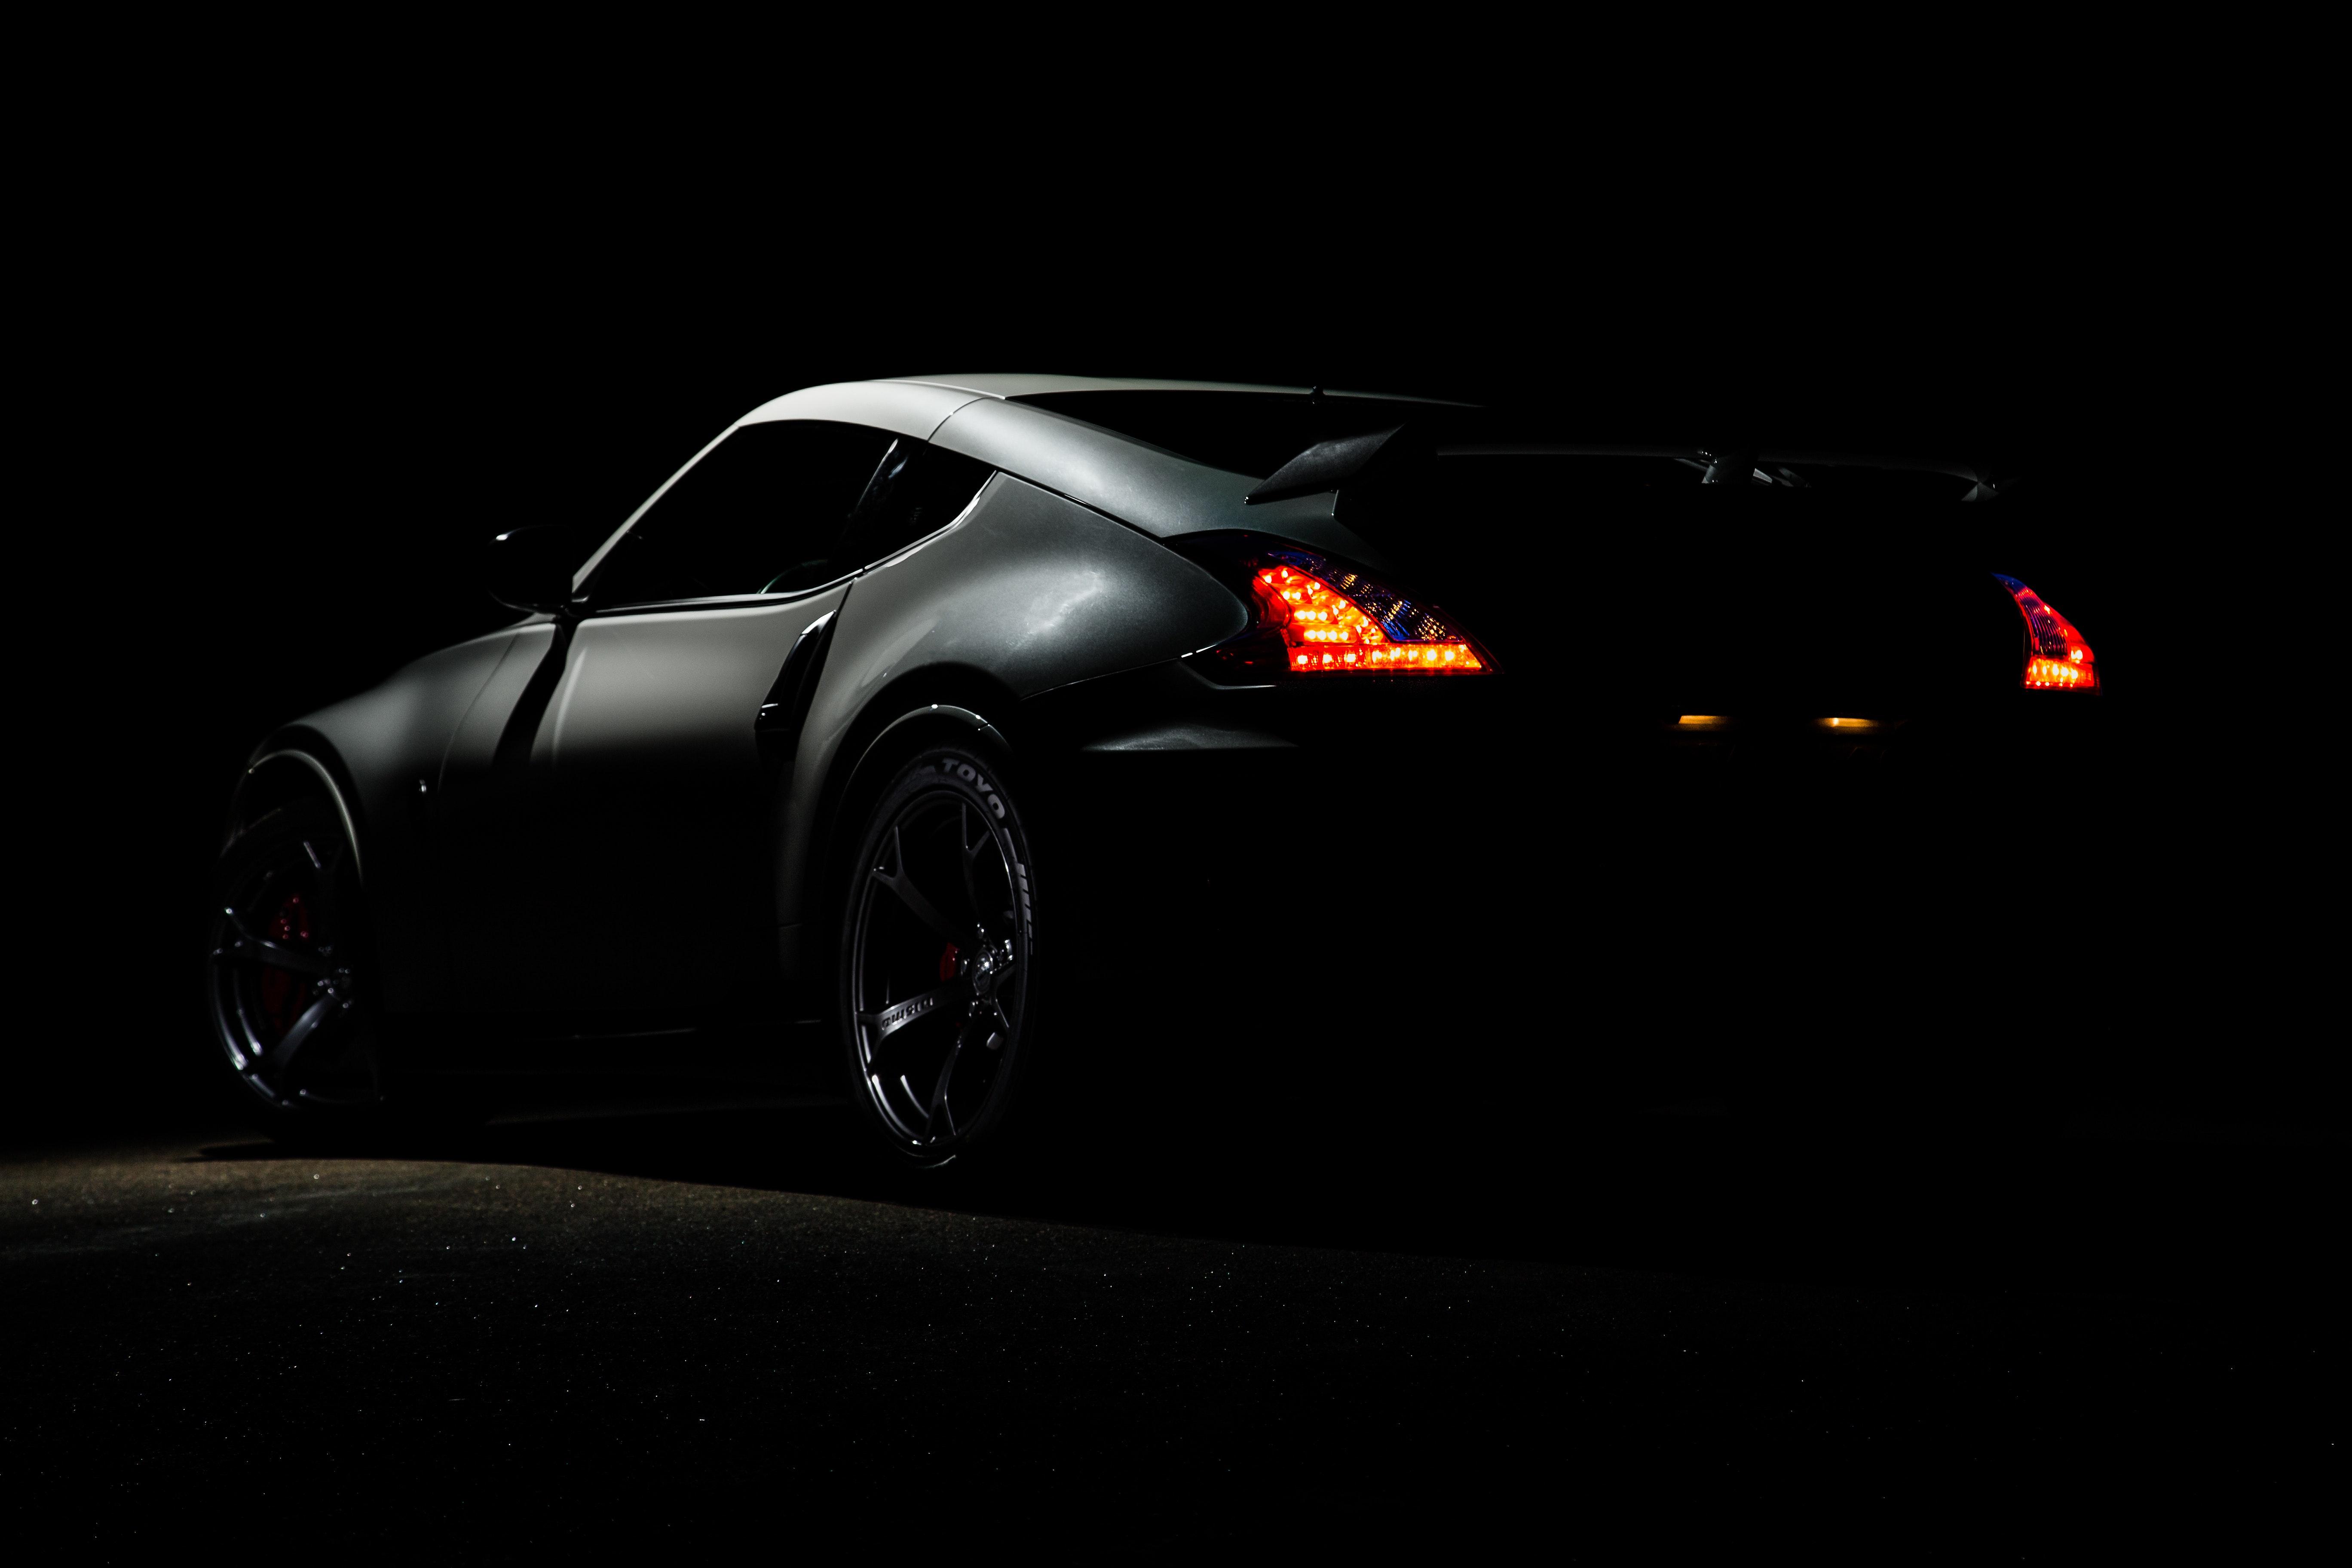 1000+ amazing sports car photos · pexels · free stock photos